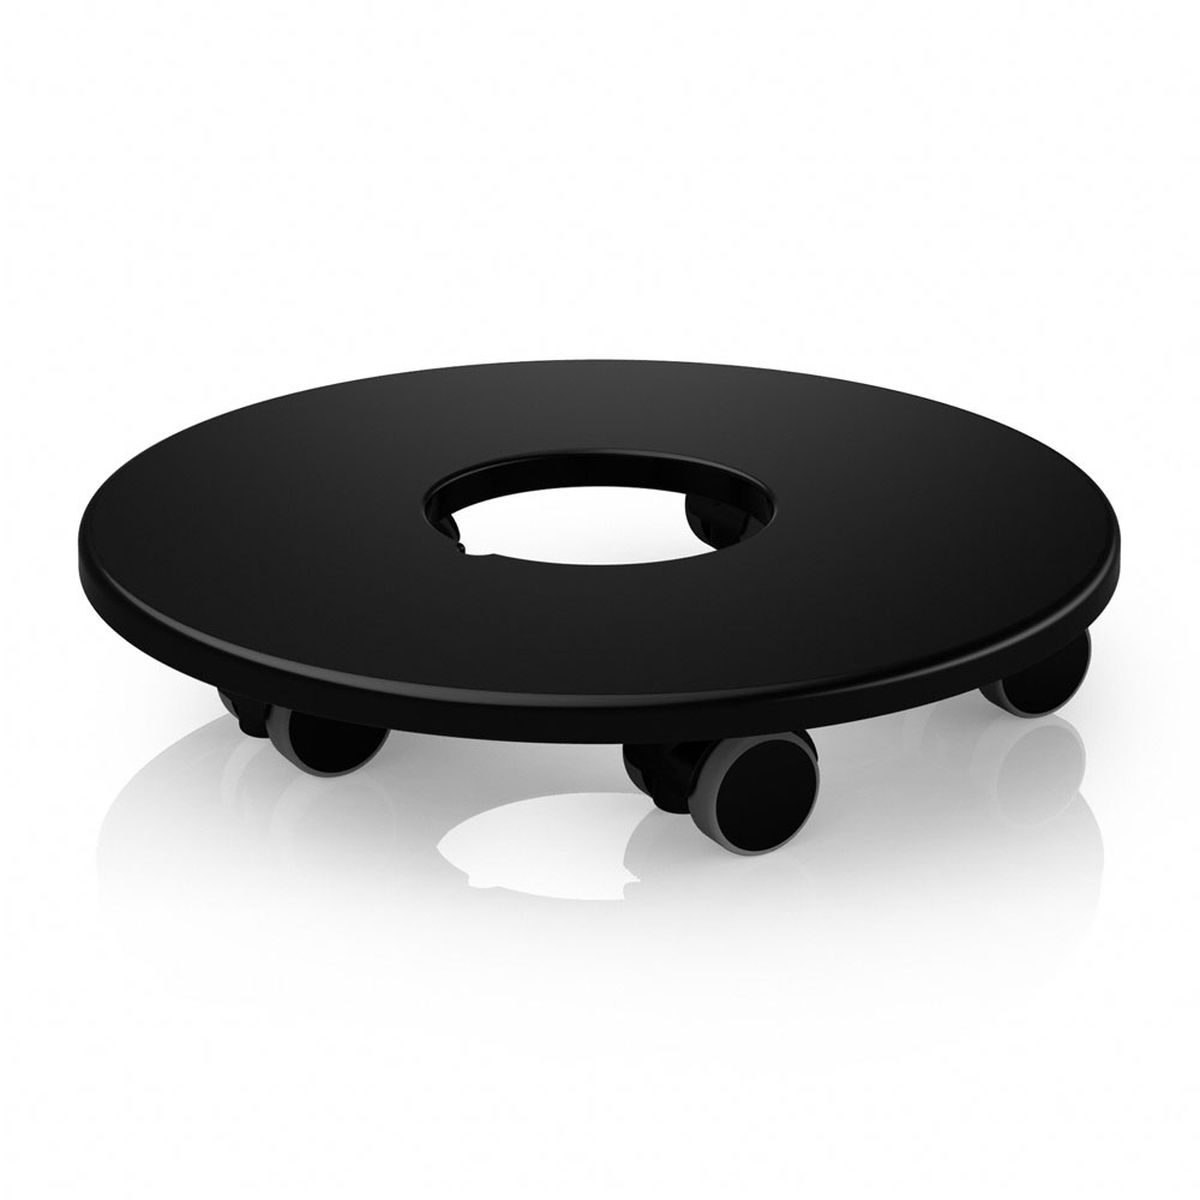 Подставка Lechuza для кашпо диаметром 50 см, на колесах, цвет: черный подставки для кашпо